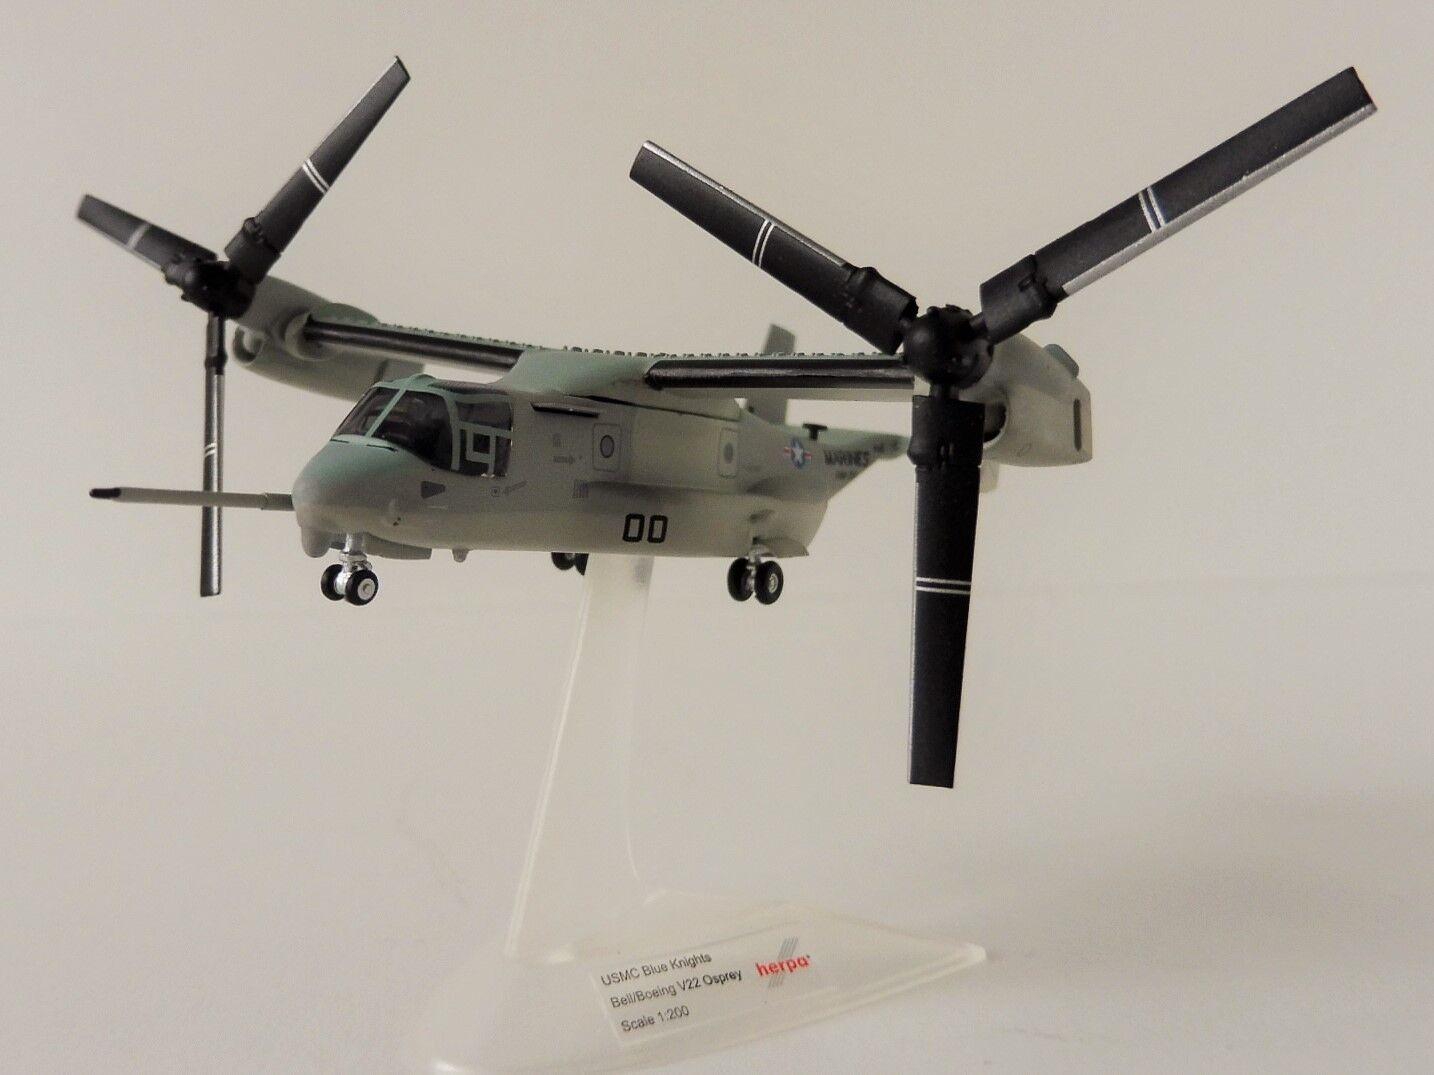 Bell Boeing mv-22b U.S. MARINE CORPS blu Knights 1 200 Herpa 558549 v-22 Osprey